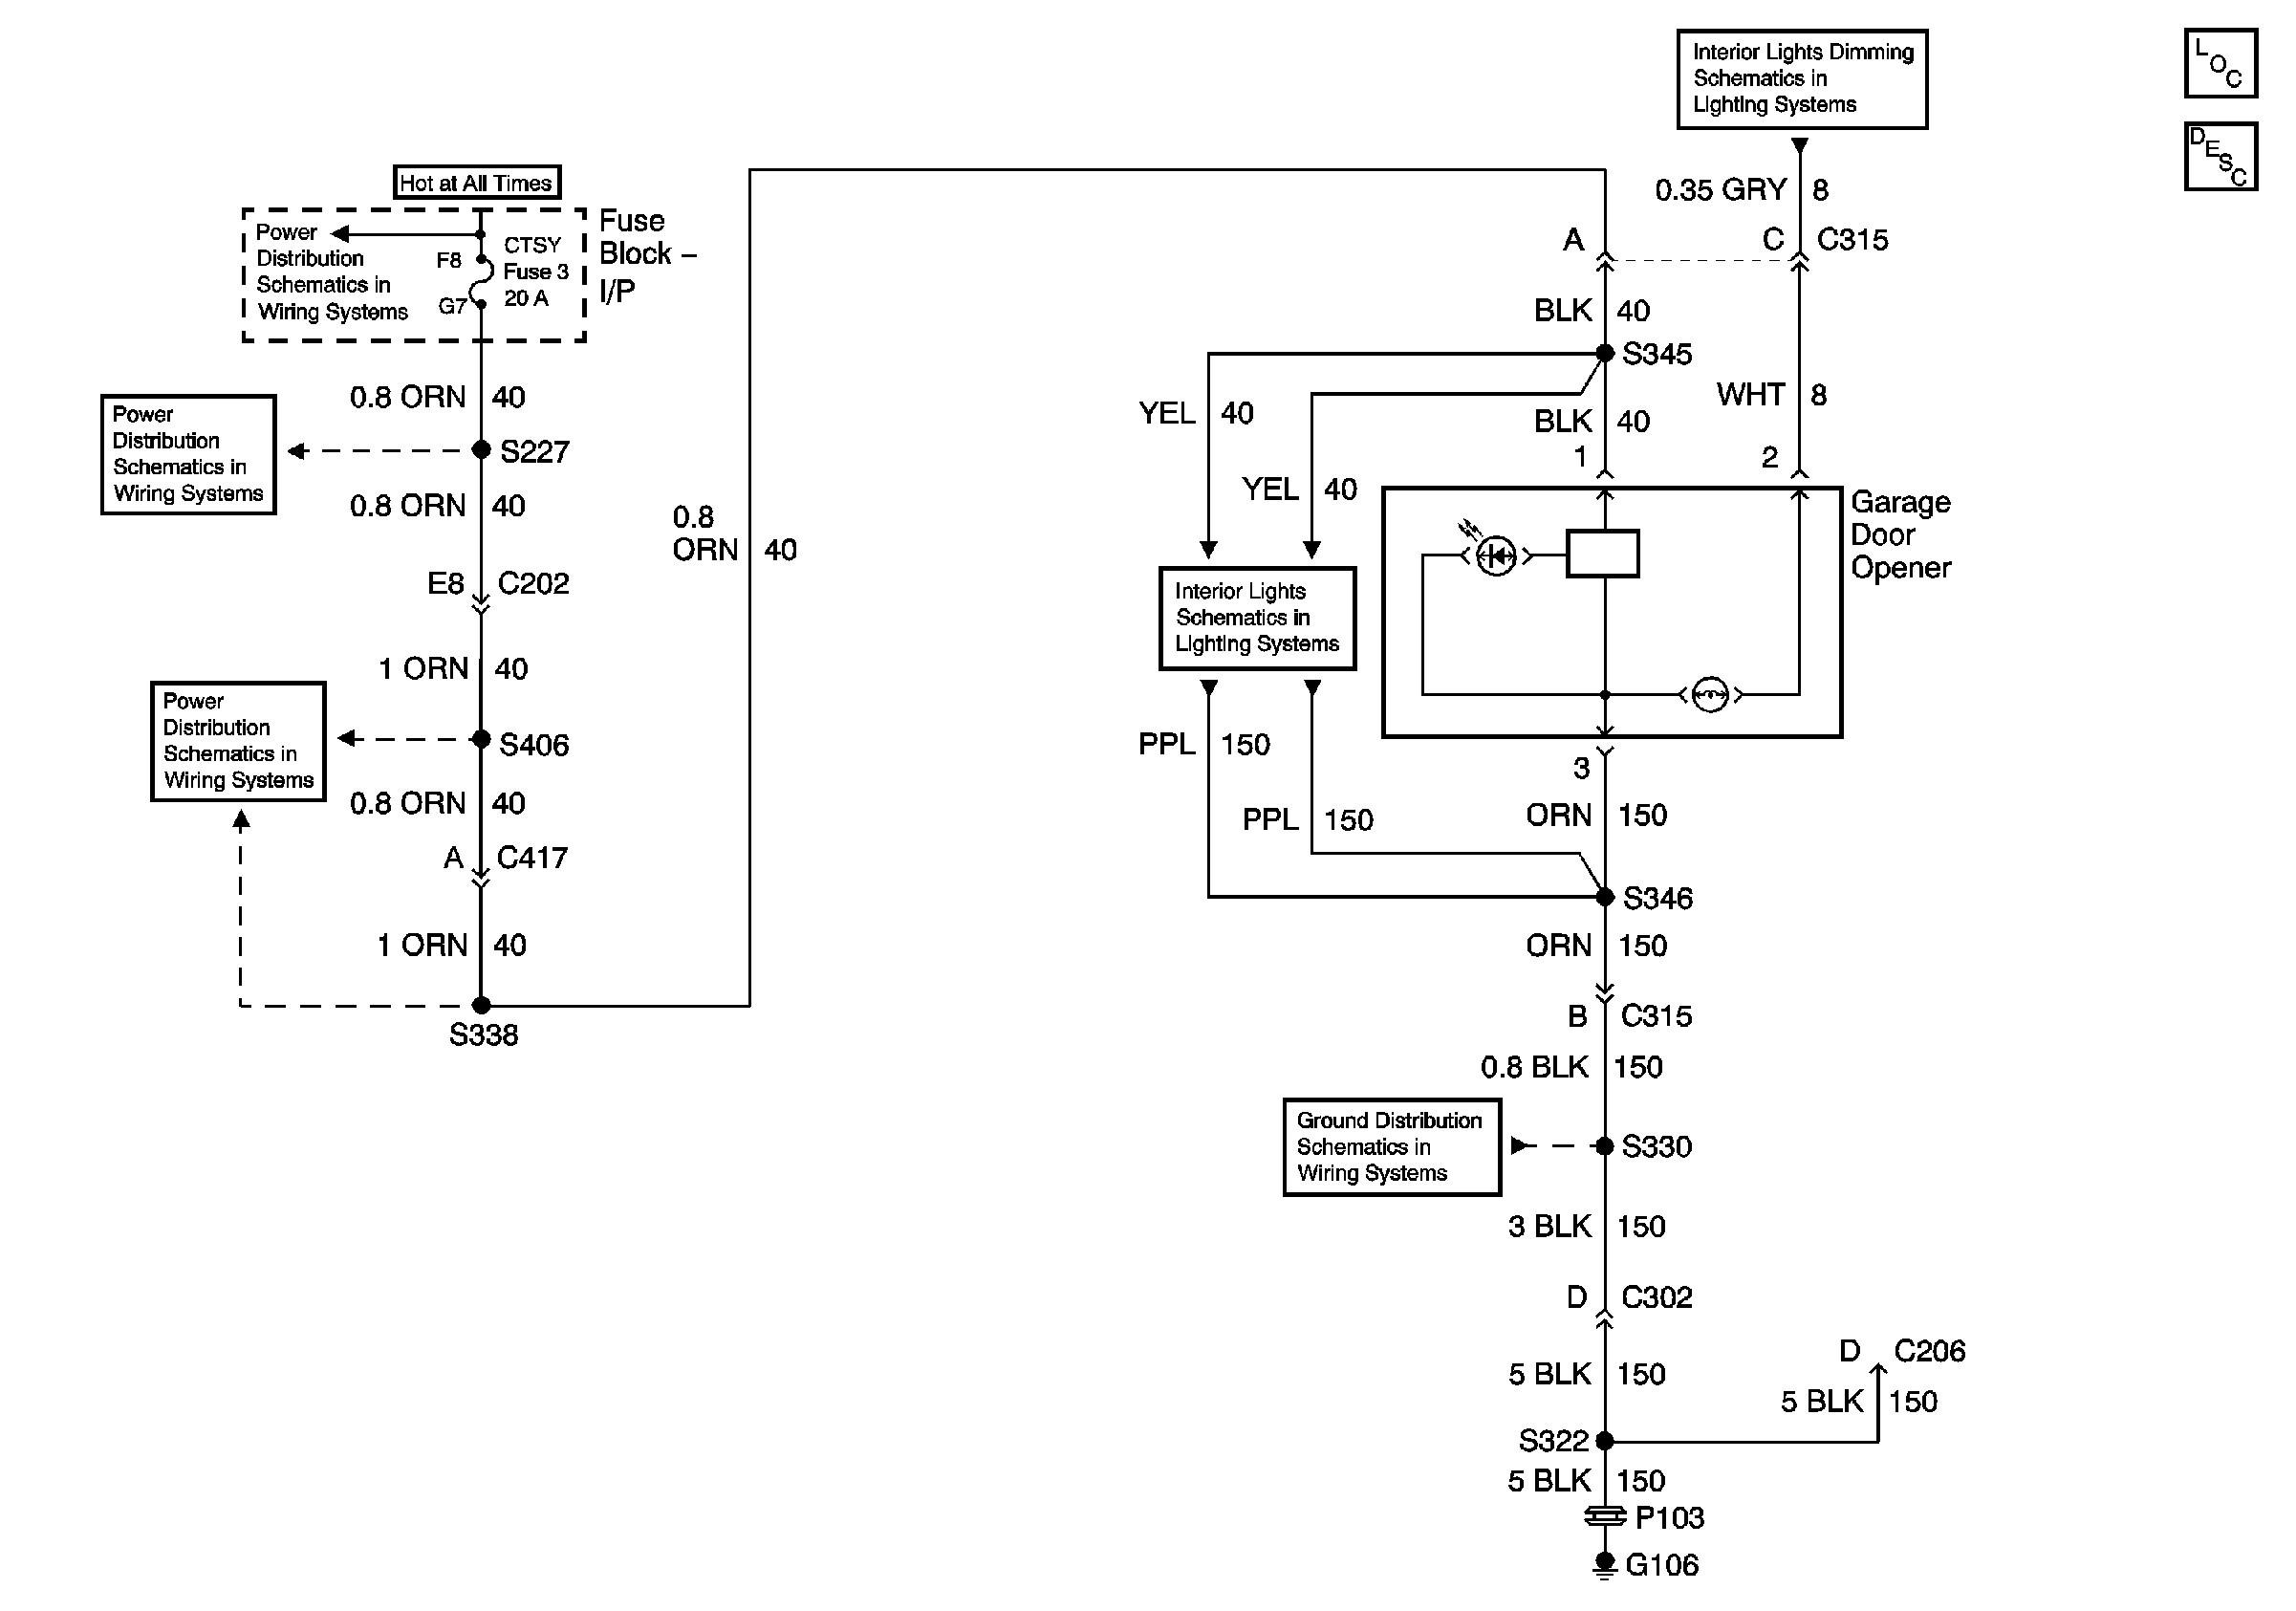 2006 Scion Xb Wiring Harness Layout Diagrams 06 Vibe Diagram Headlights 2009 Xd Fuse Box Auto Electrical Rh Radtour Co Radio Tail Light